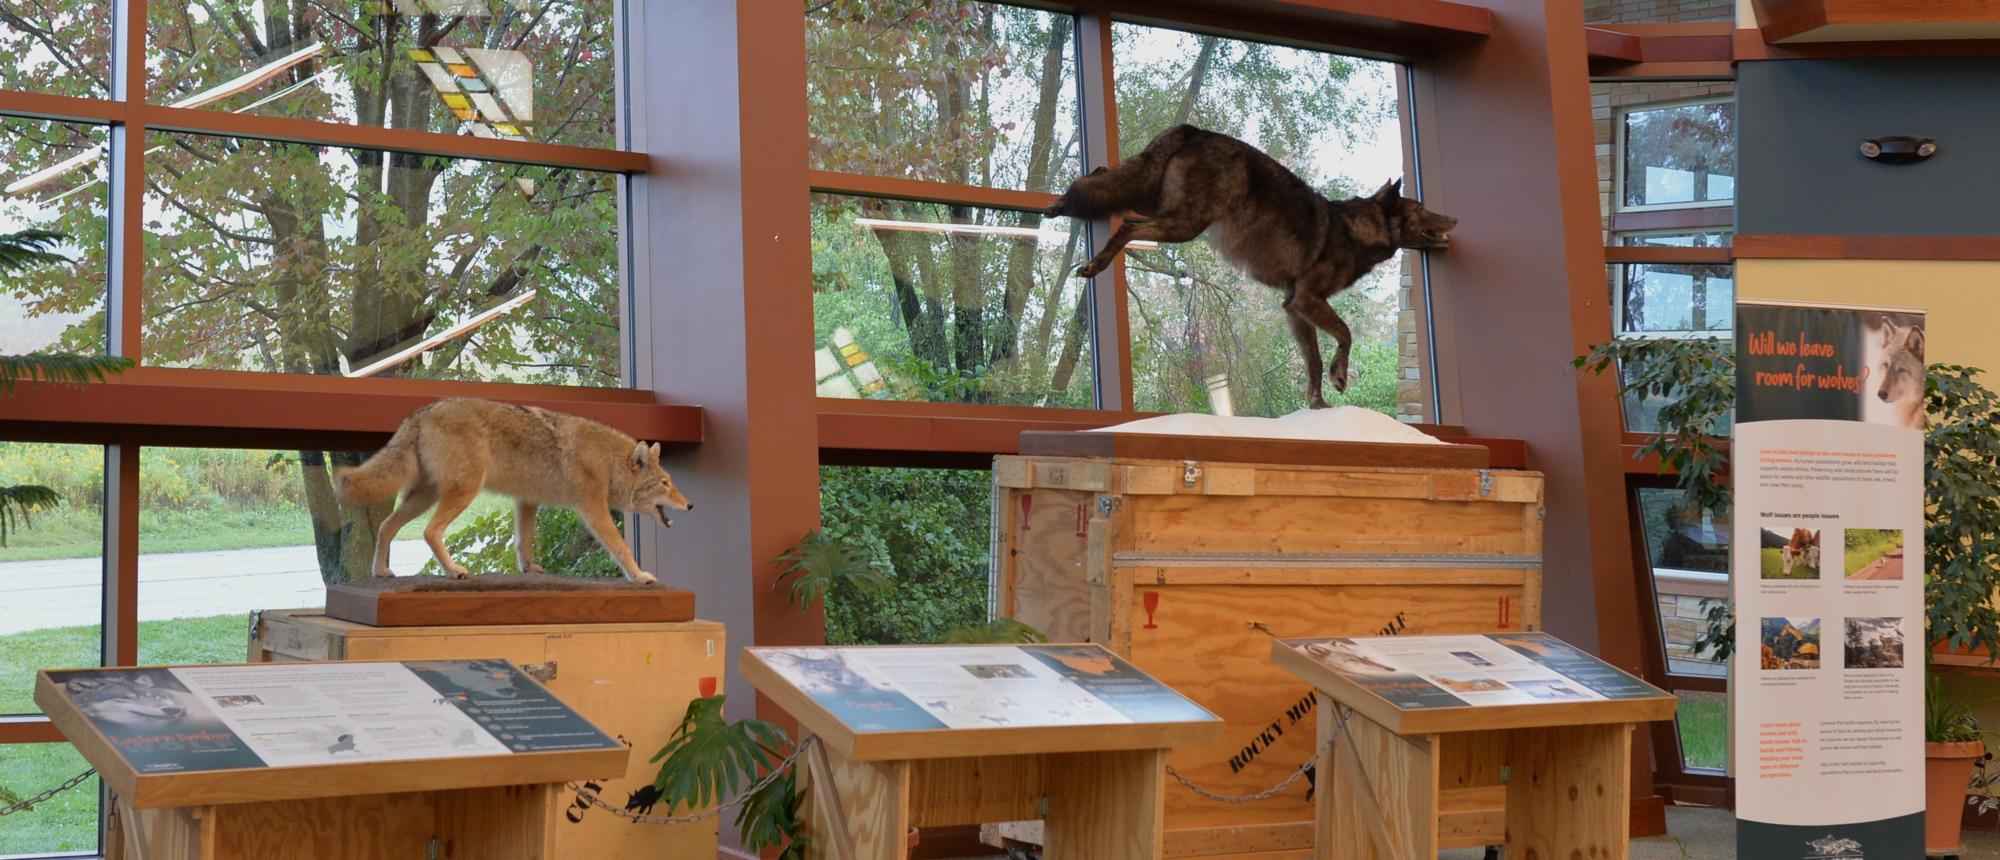 Wolf Exhibit at Como